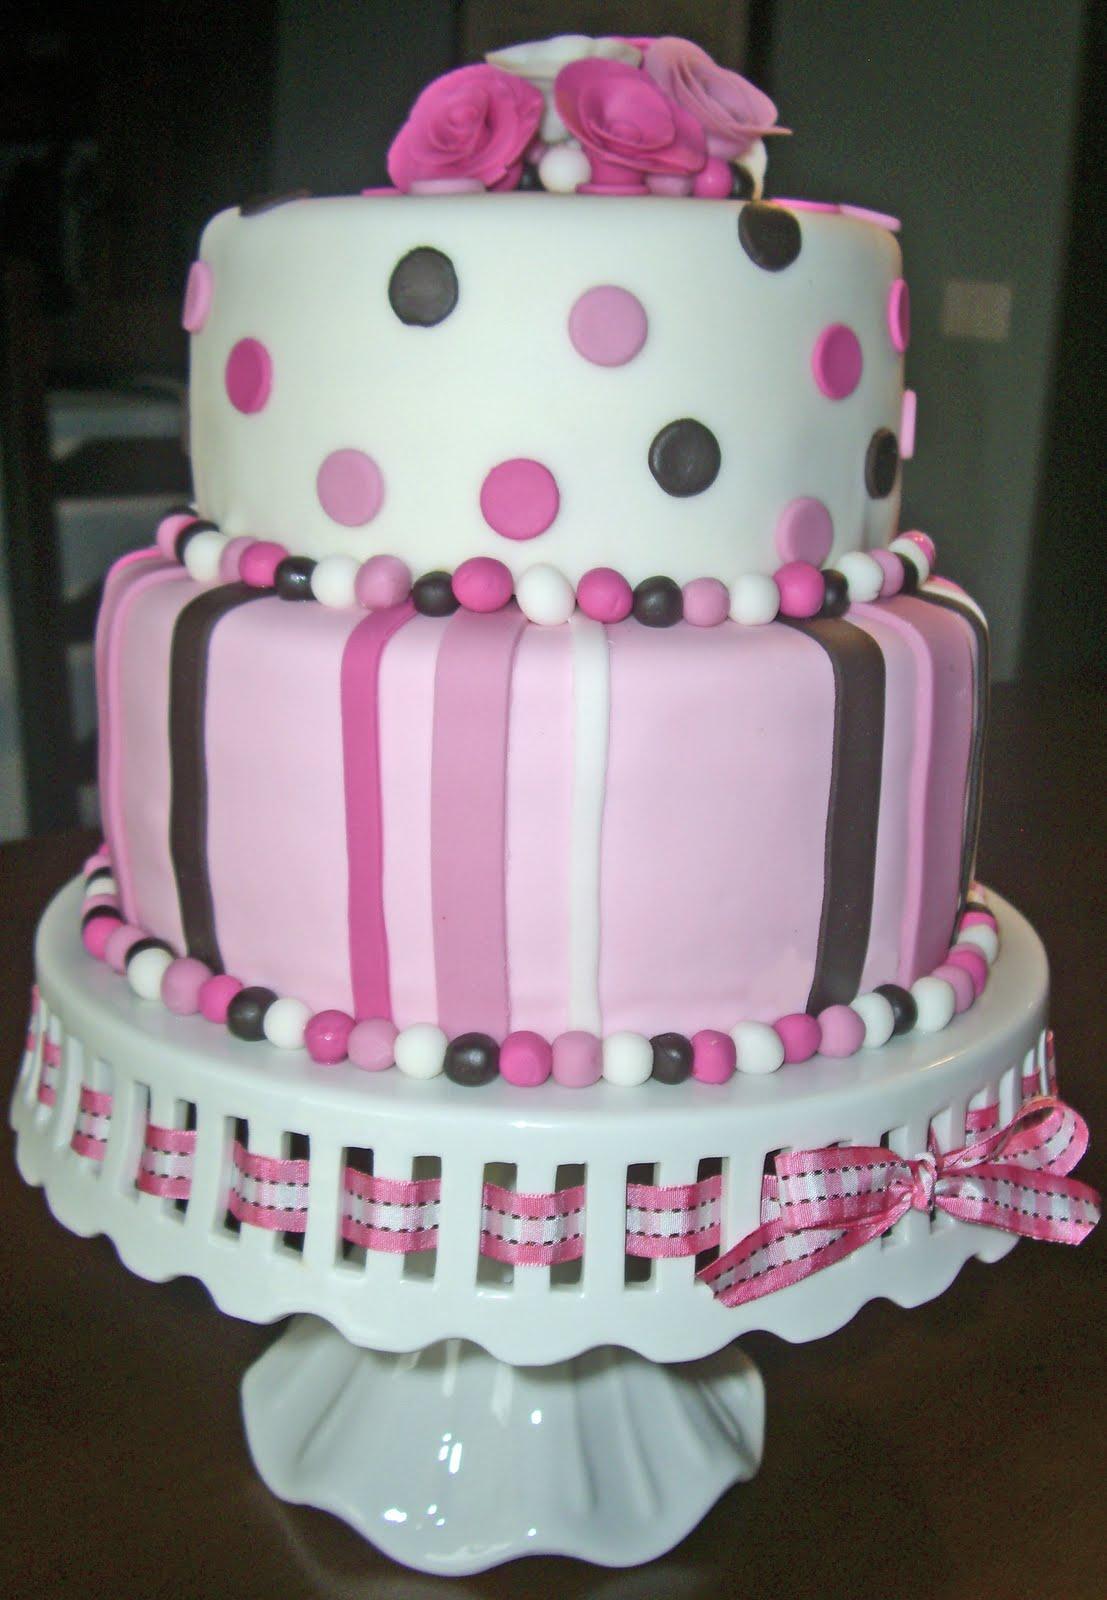 13th Birthday Cake  My FaVoriTe CaKe PlaCe